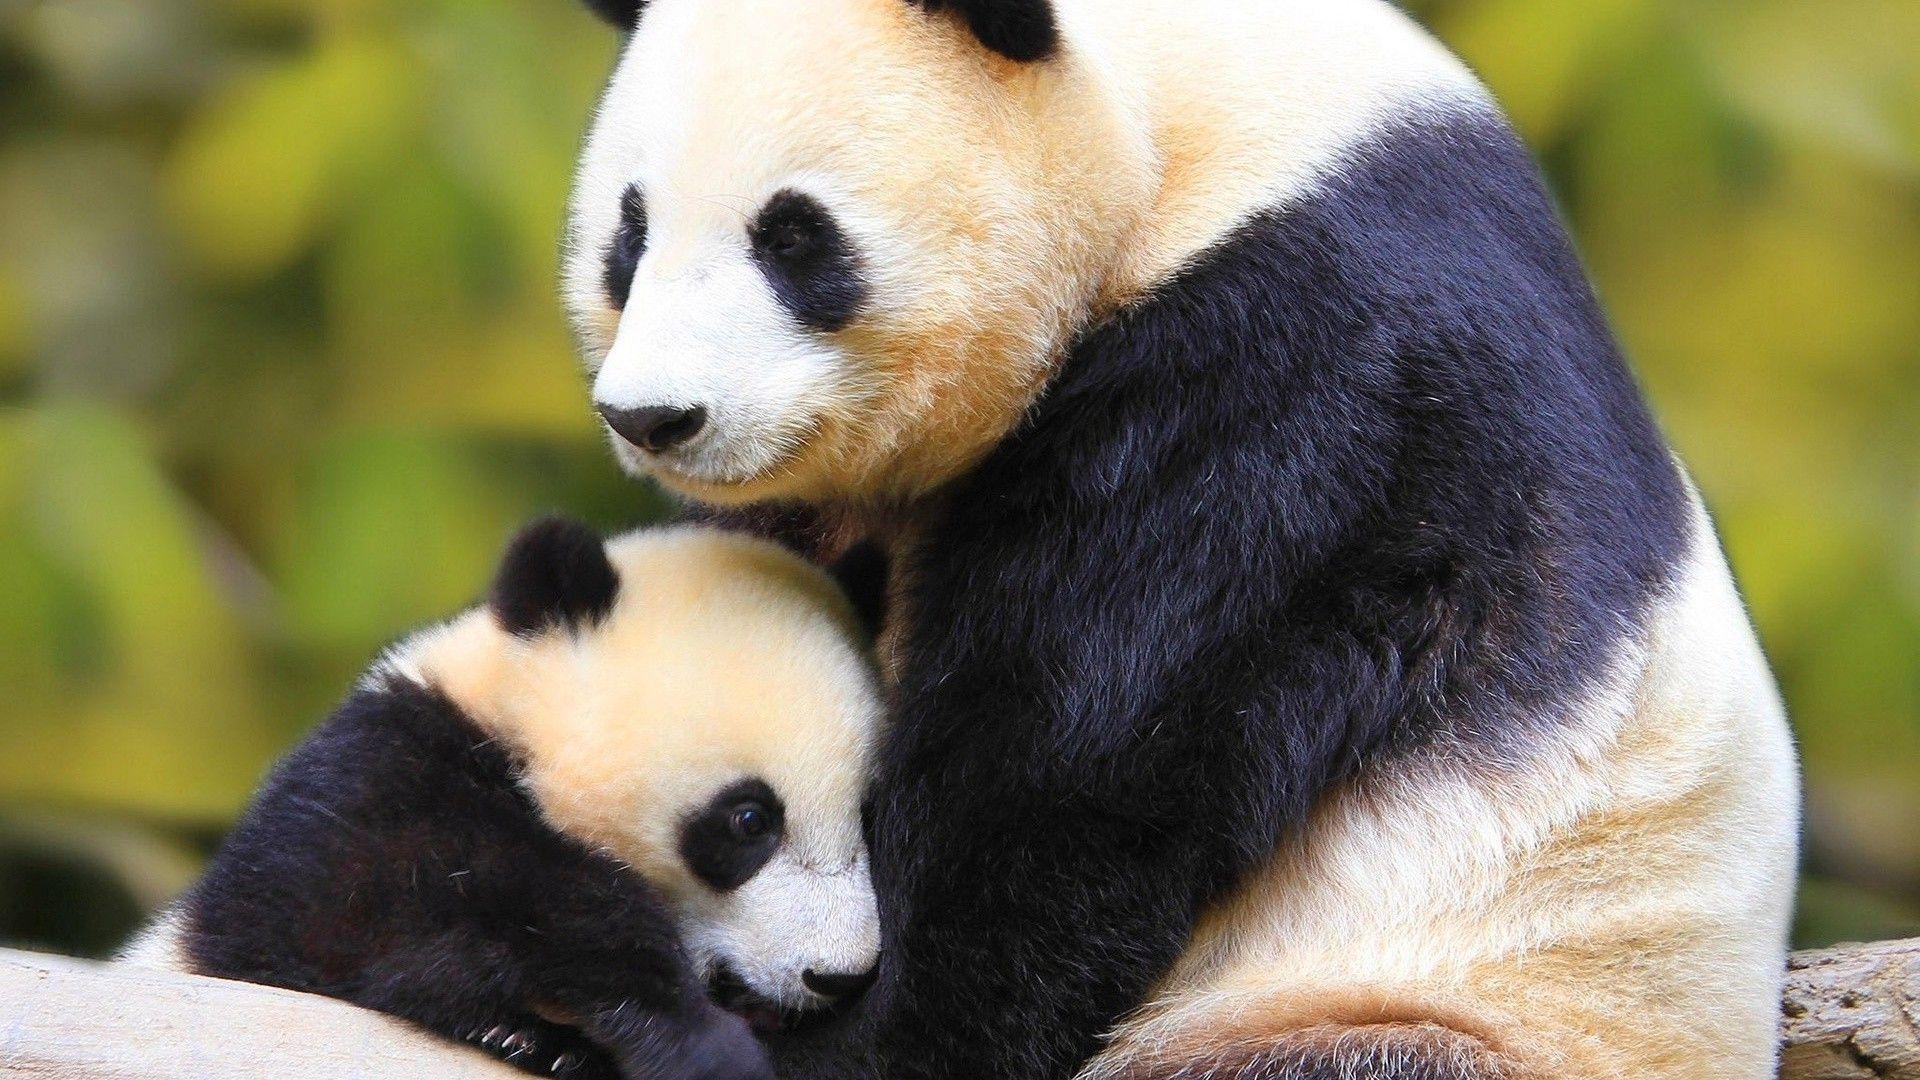 Panda Cub Photos